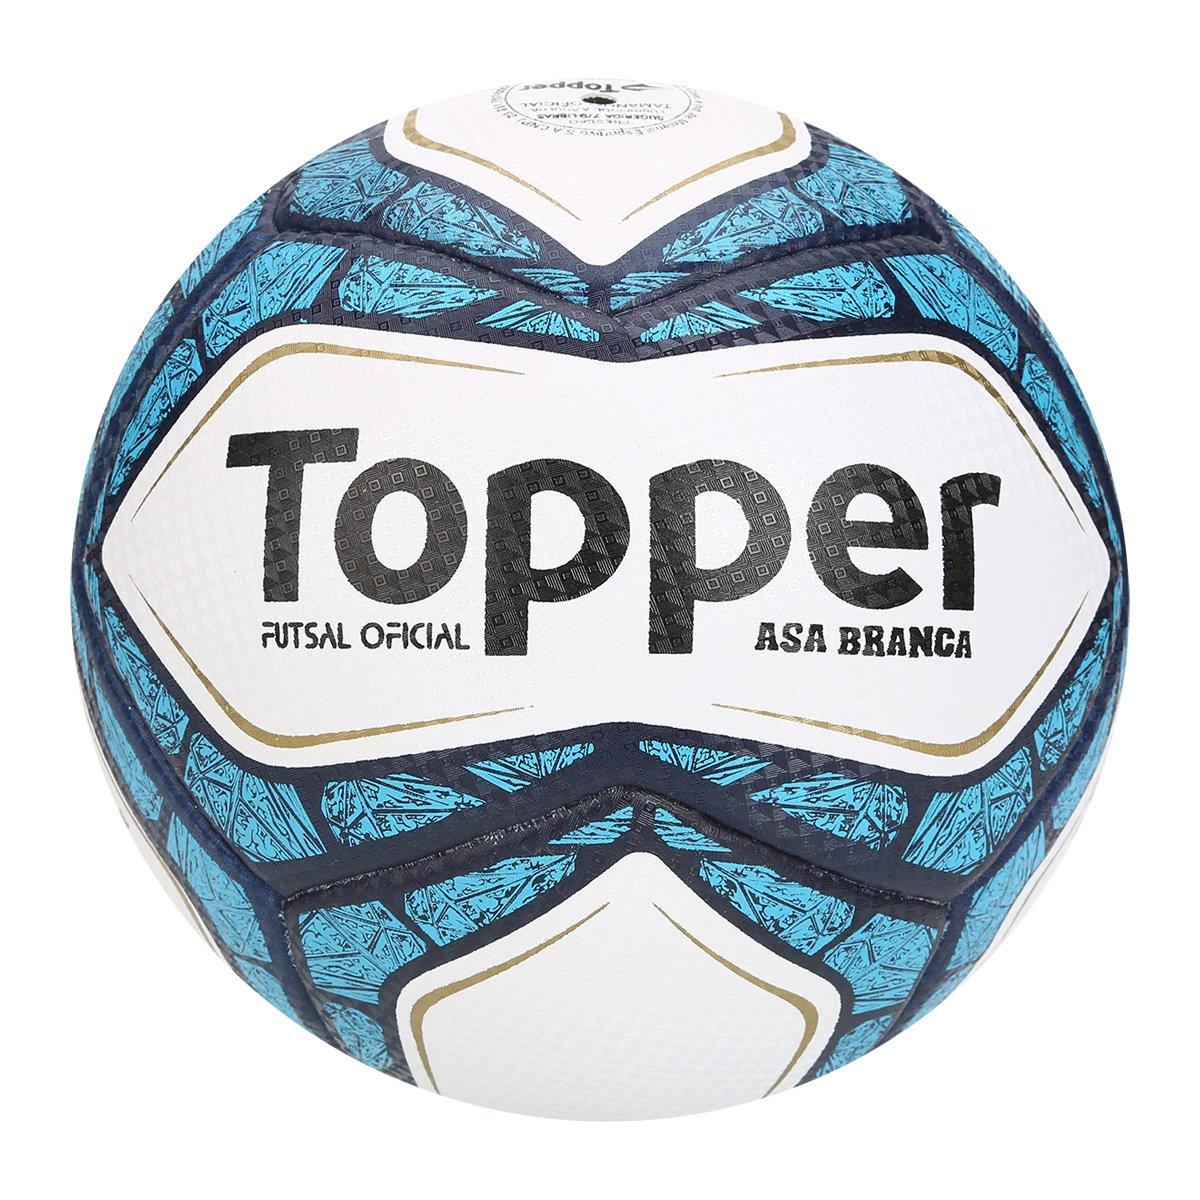 d1569b5c6c Bola Futsal Topper Asa Branca